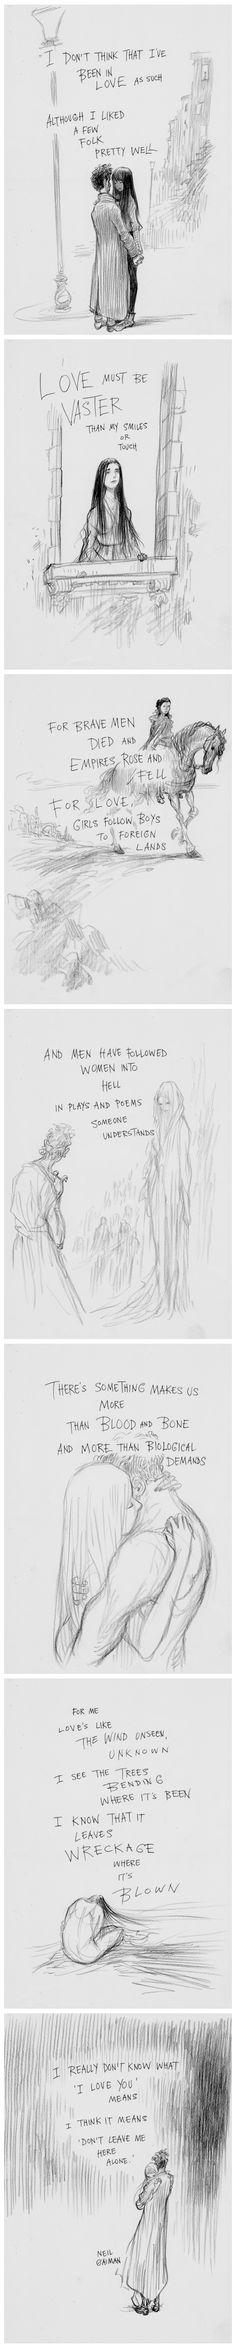 Dark Sonnet by Neil Gaiman, illustrated by Chris Riddell #Poetry #Poem #Illustration #Drawing